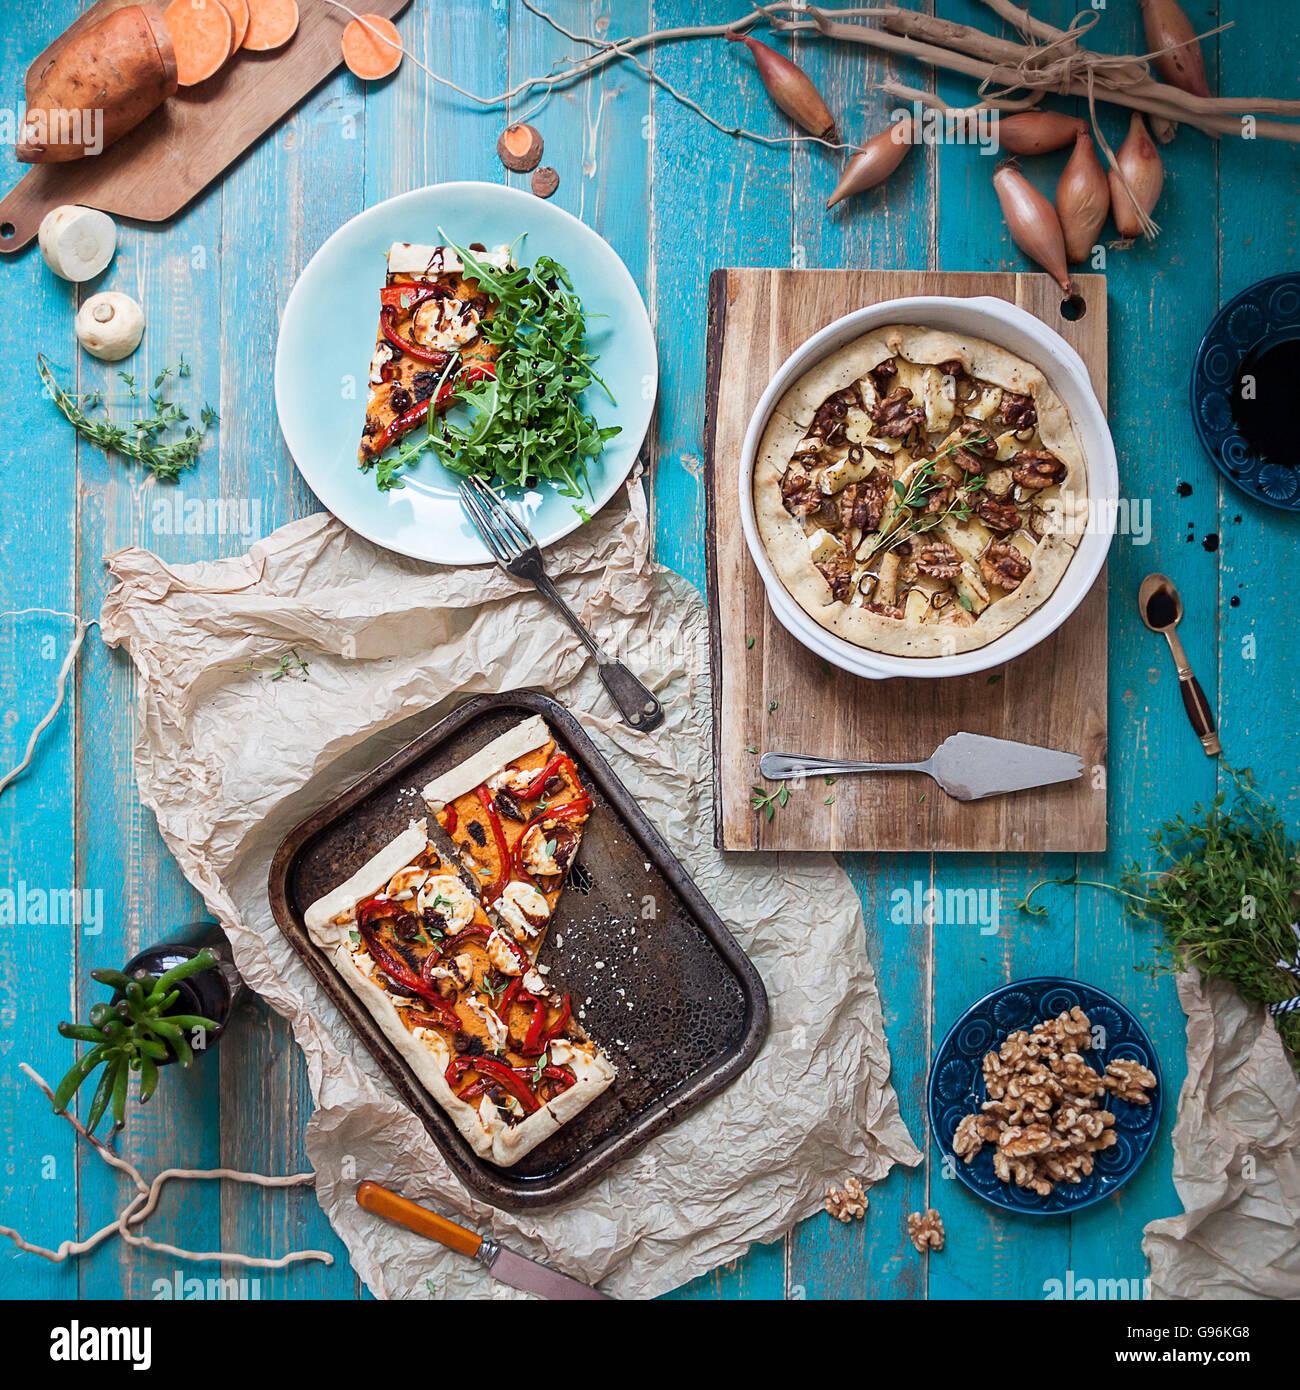 Table-top vista mobile di salato torte vegetariane e vari ingredienti Immagini Stock